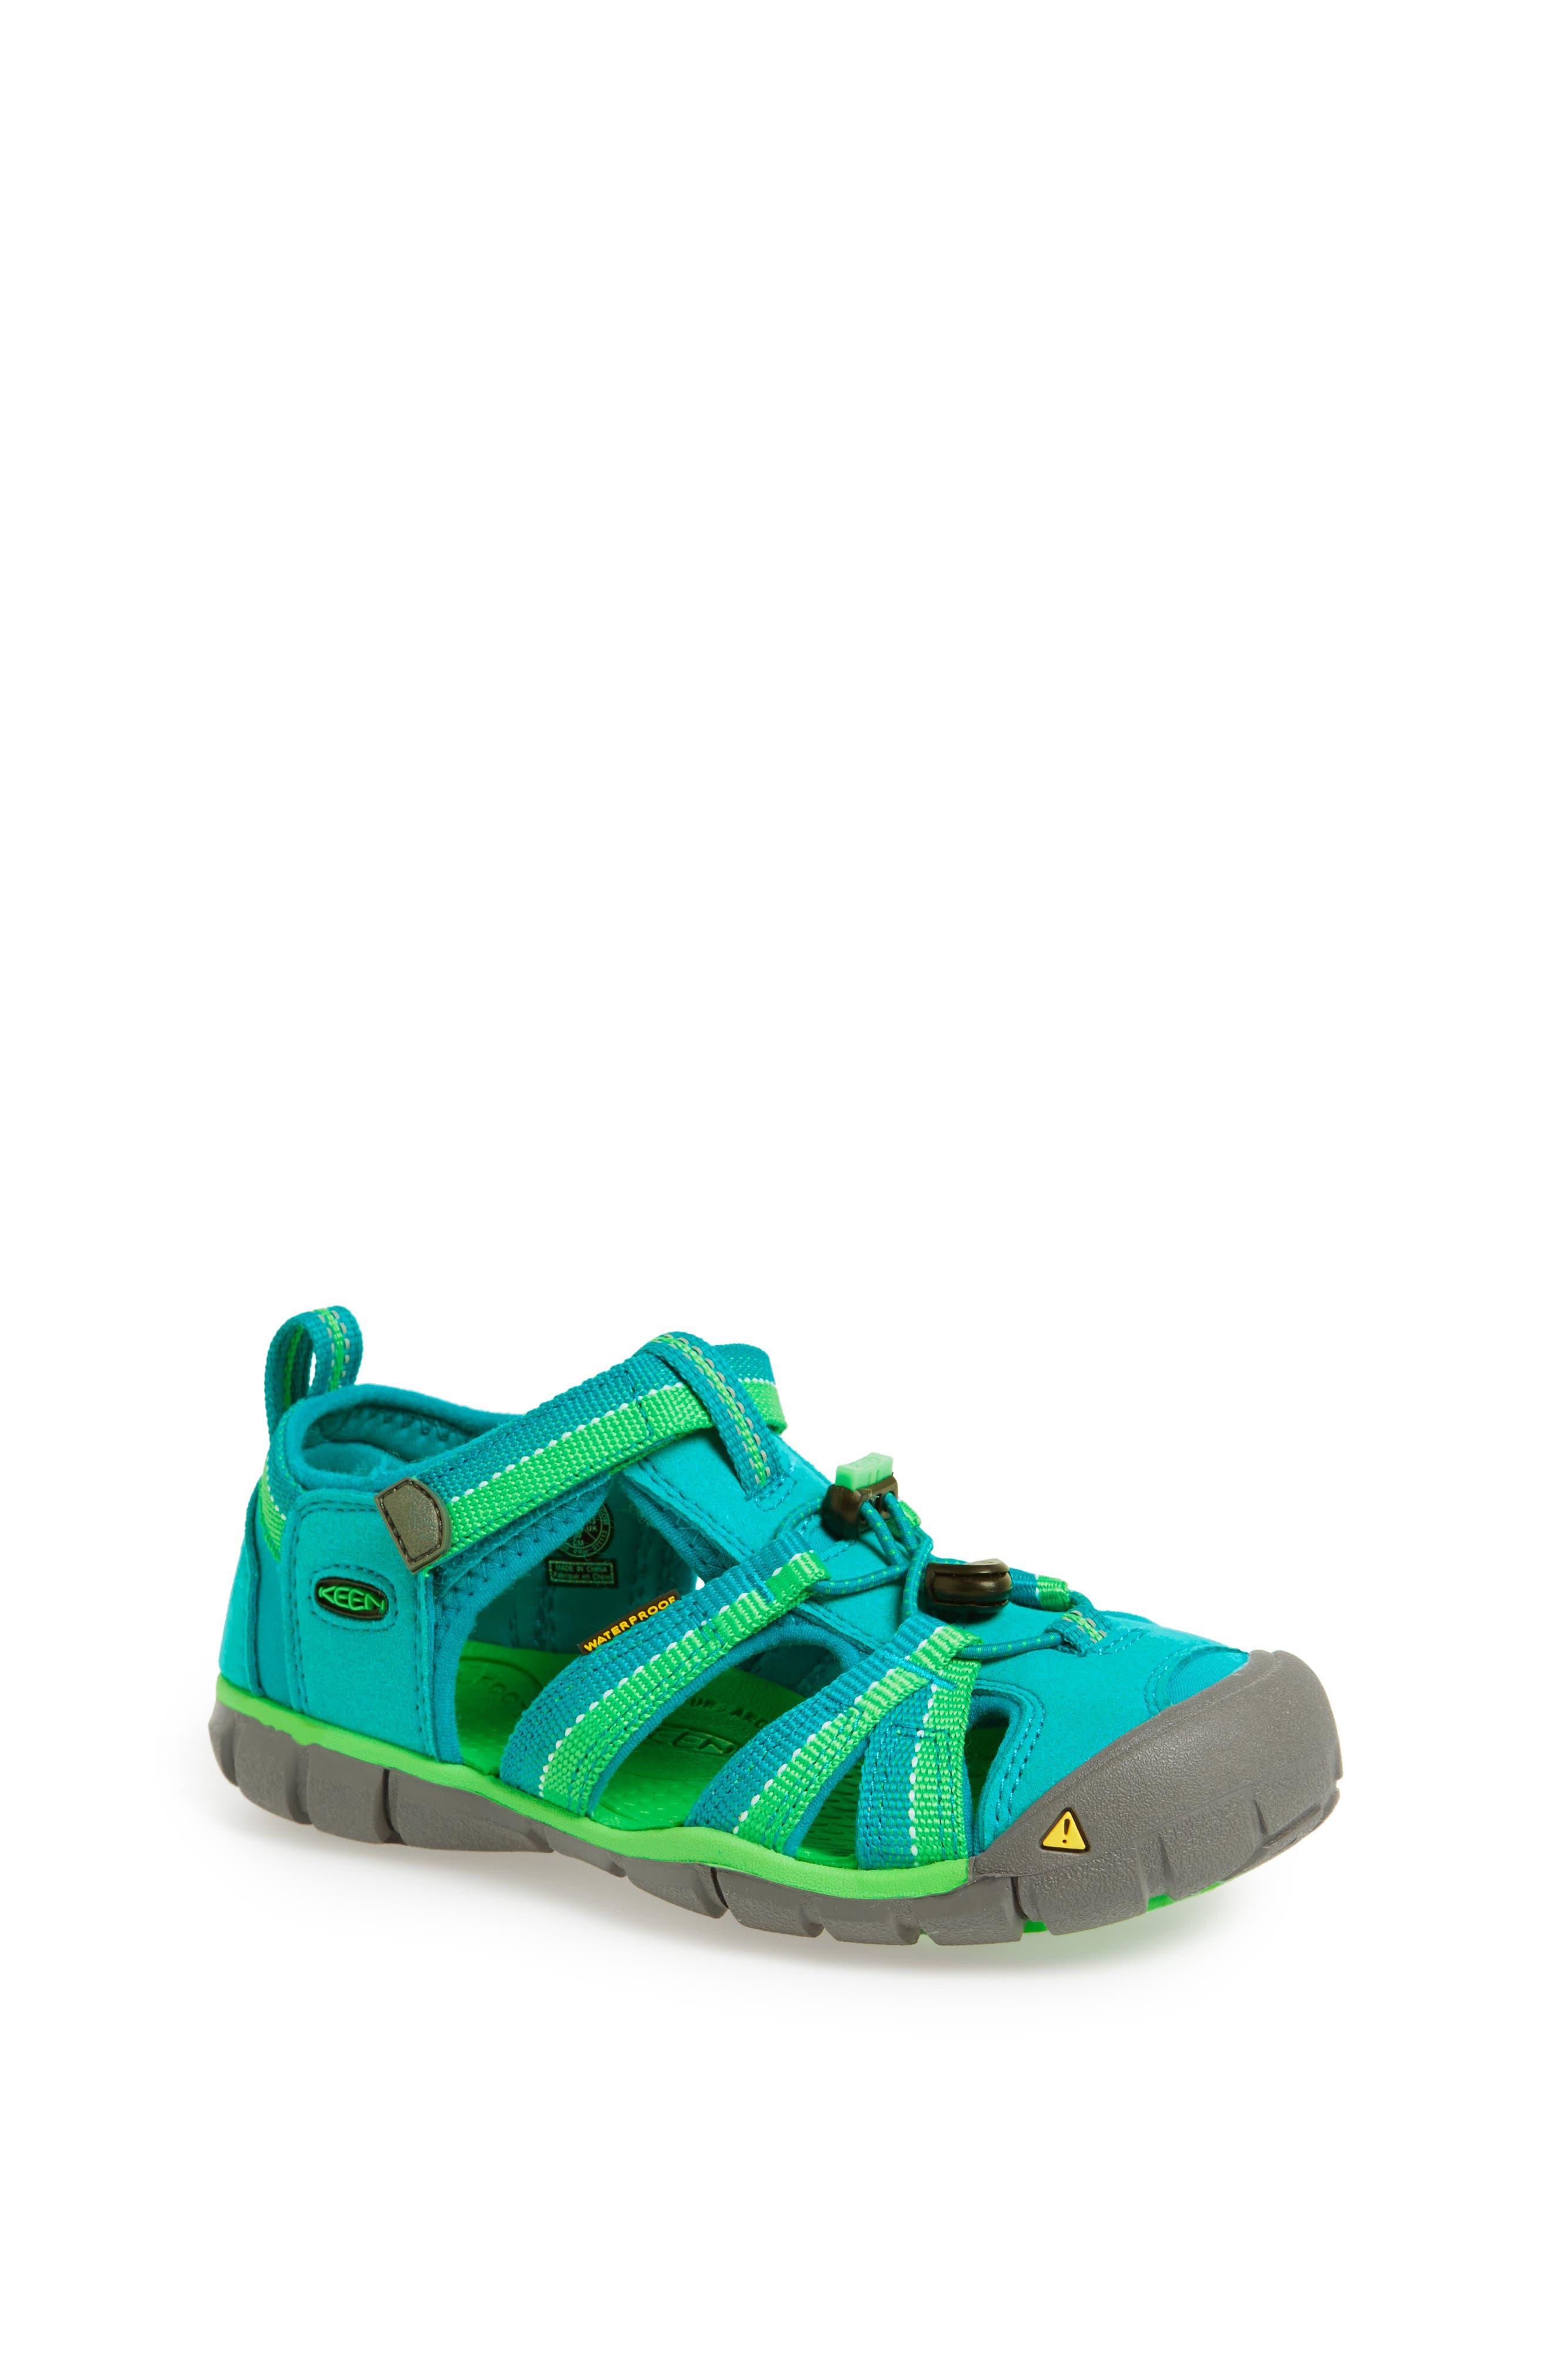 ,                             'Seacamp II' Water Friendly Sandal,                             Alternate thumbnail 193, color,                             435